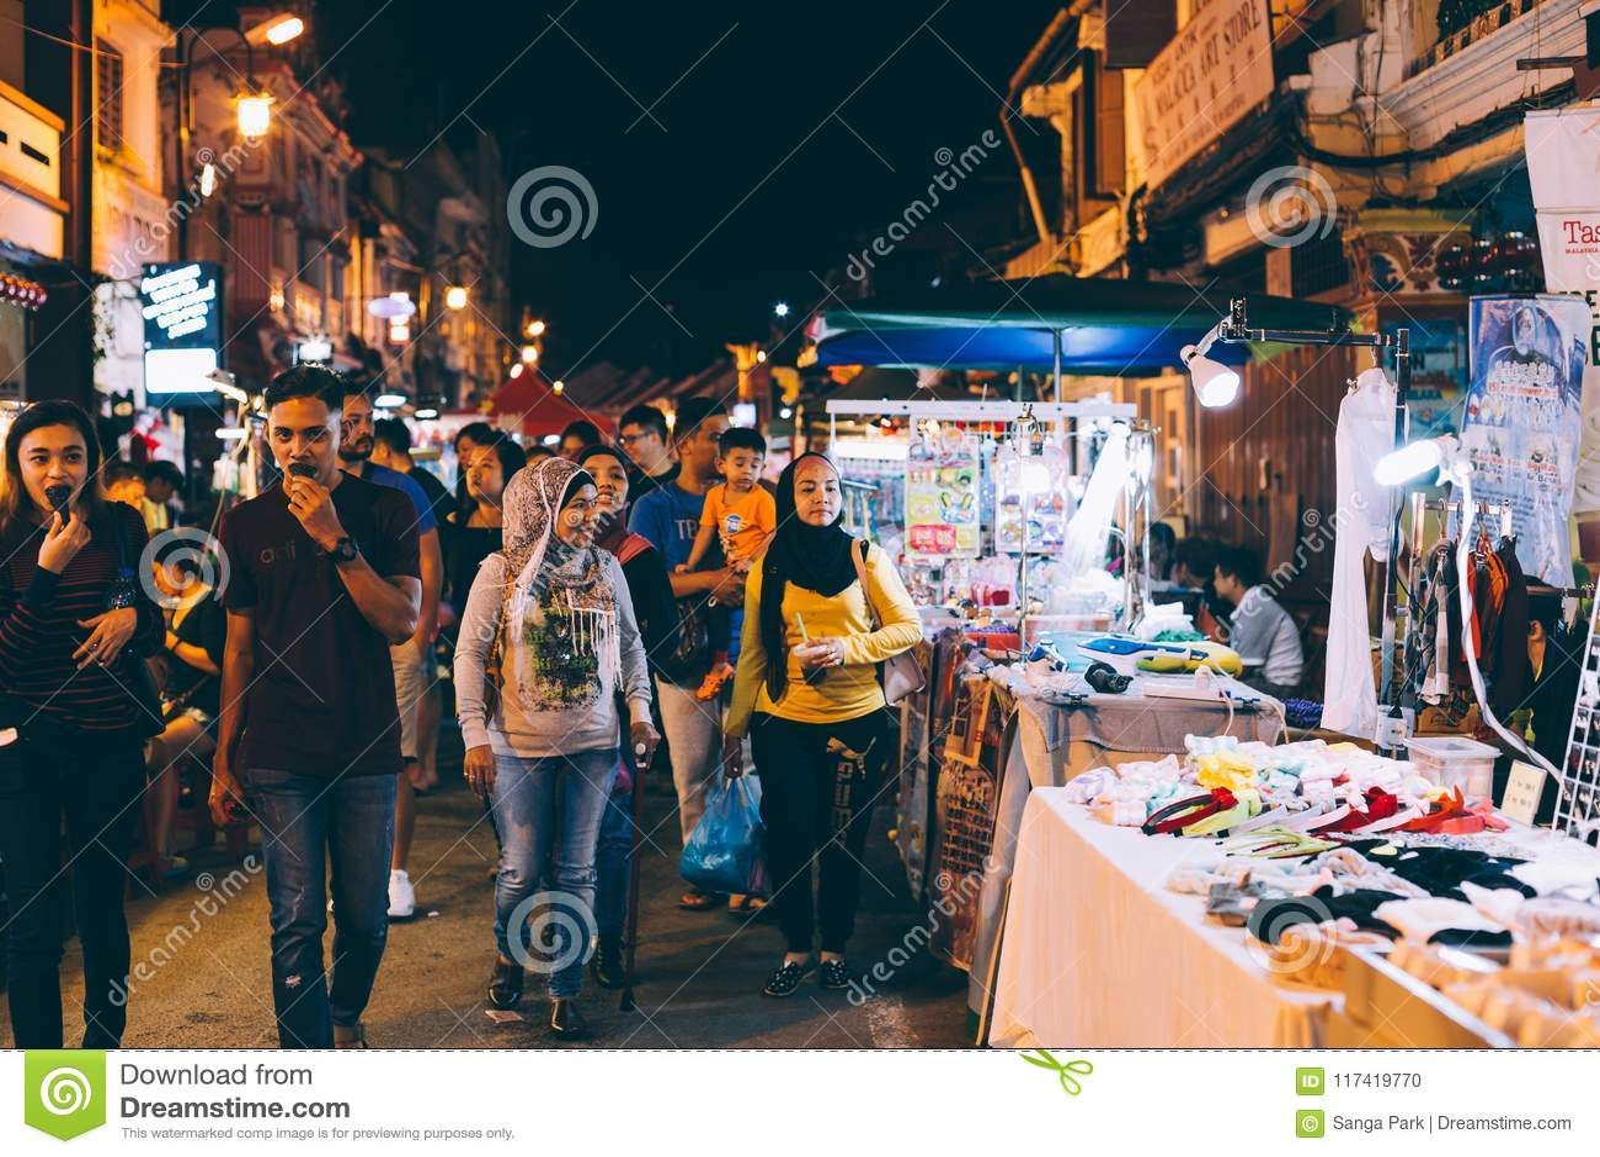 Jonker Street Night Market in Malacca, Malaysia